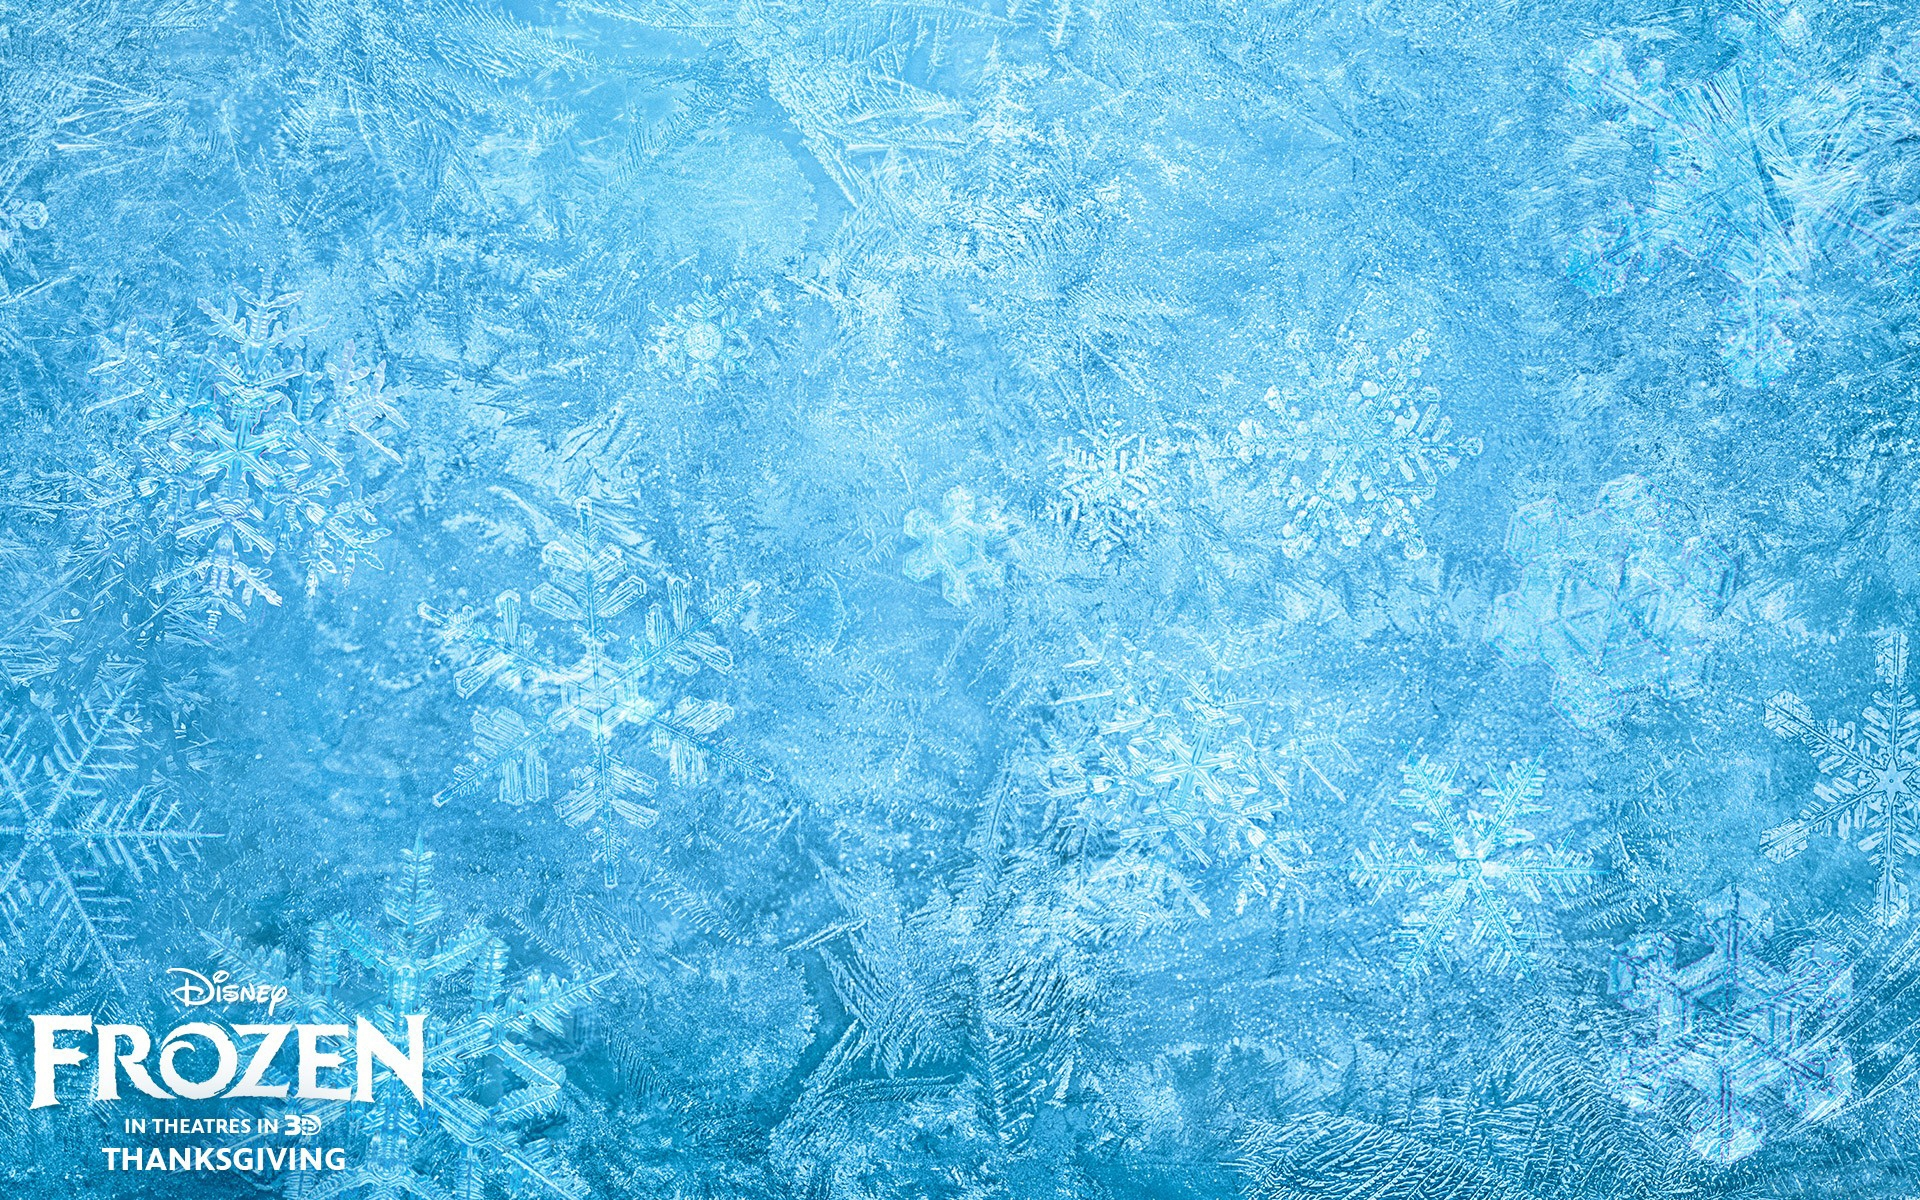 Hd Niagara Falls Wallpaper Frozen Wallpapers And Desktop Backgrounds Up To 8k